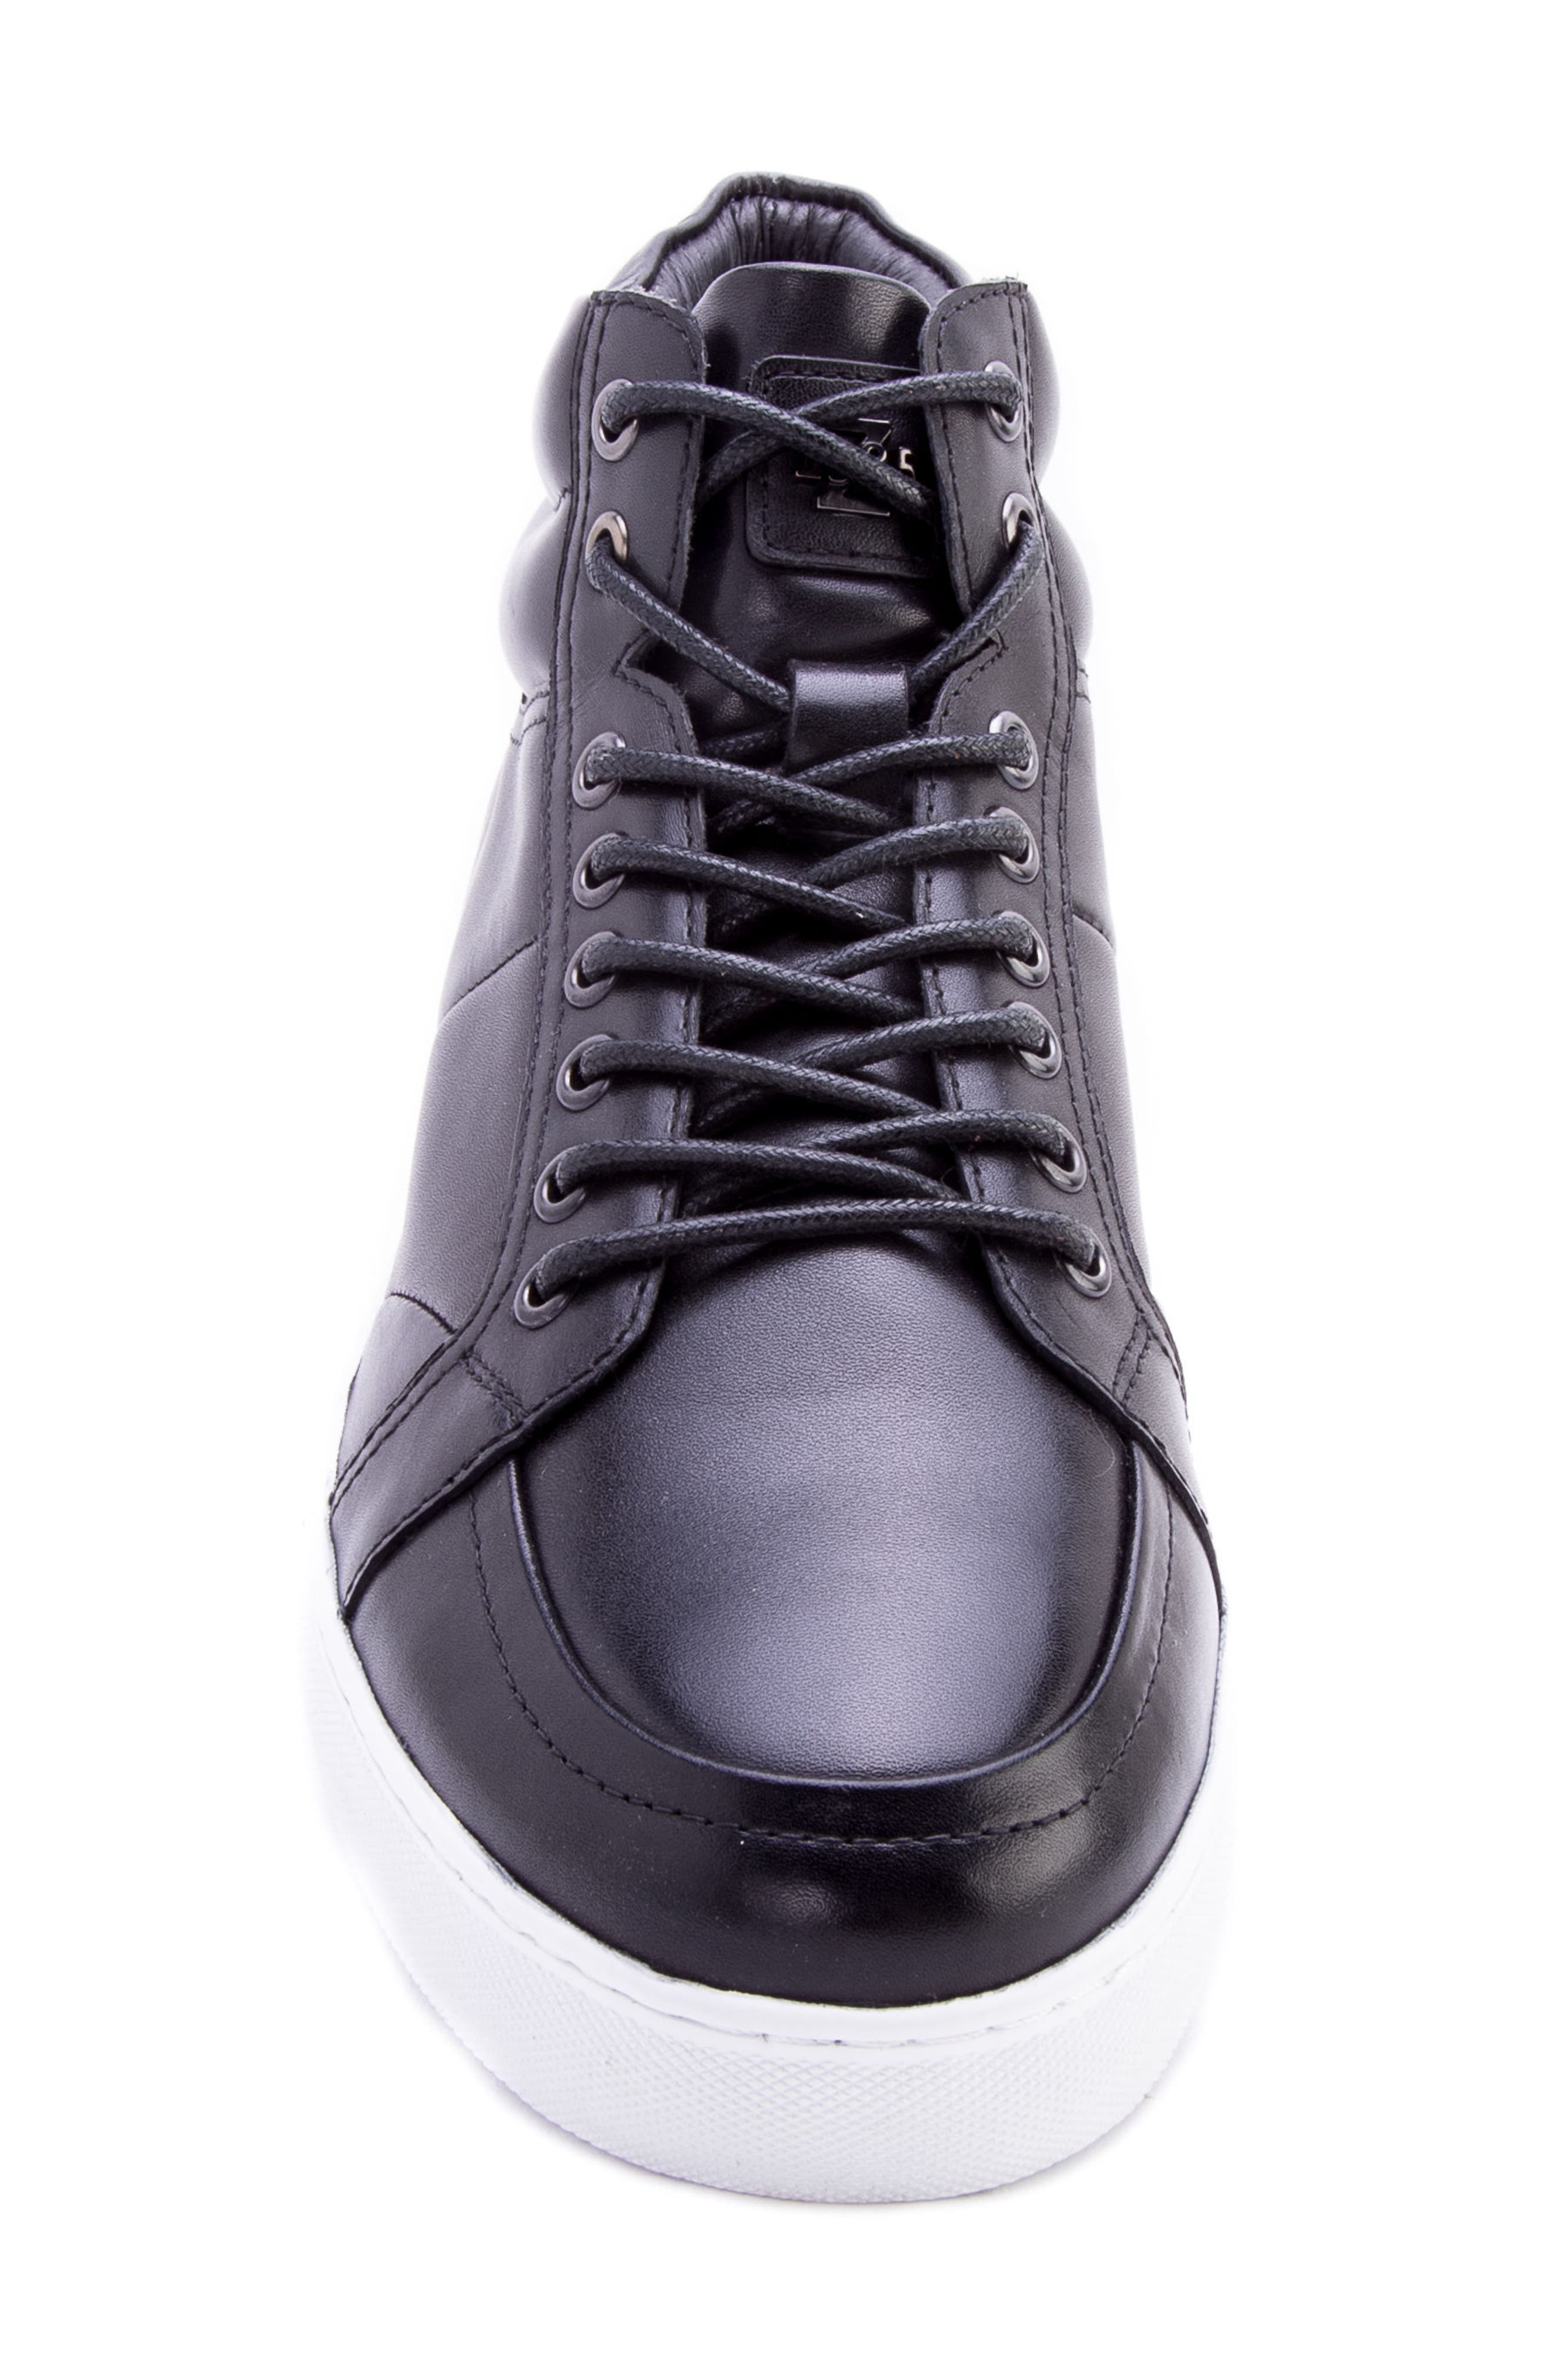 Tassel Mid Top Sneaker,                             Alternate thumbnail 5, color,                             BLACK LEATHER